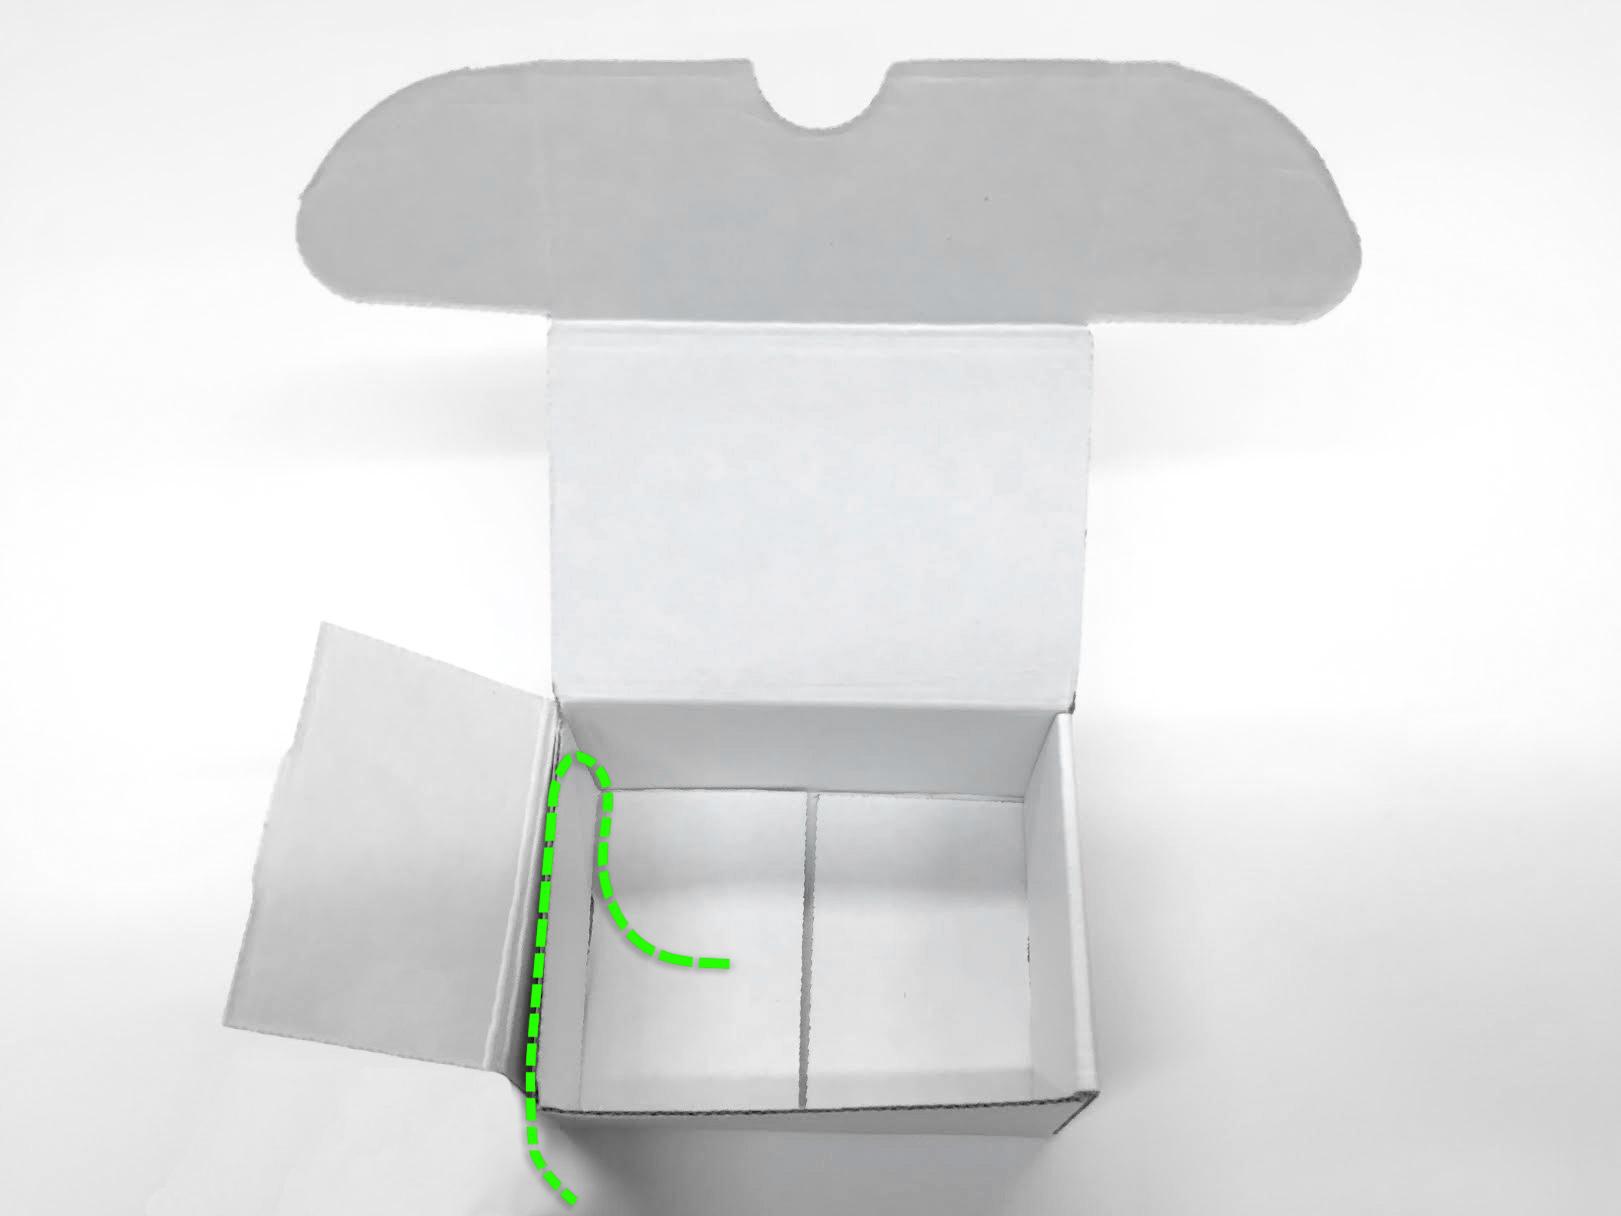 adafruit_products_newBox02.jpg